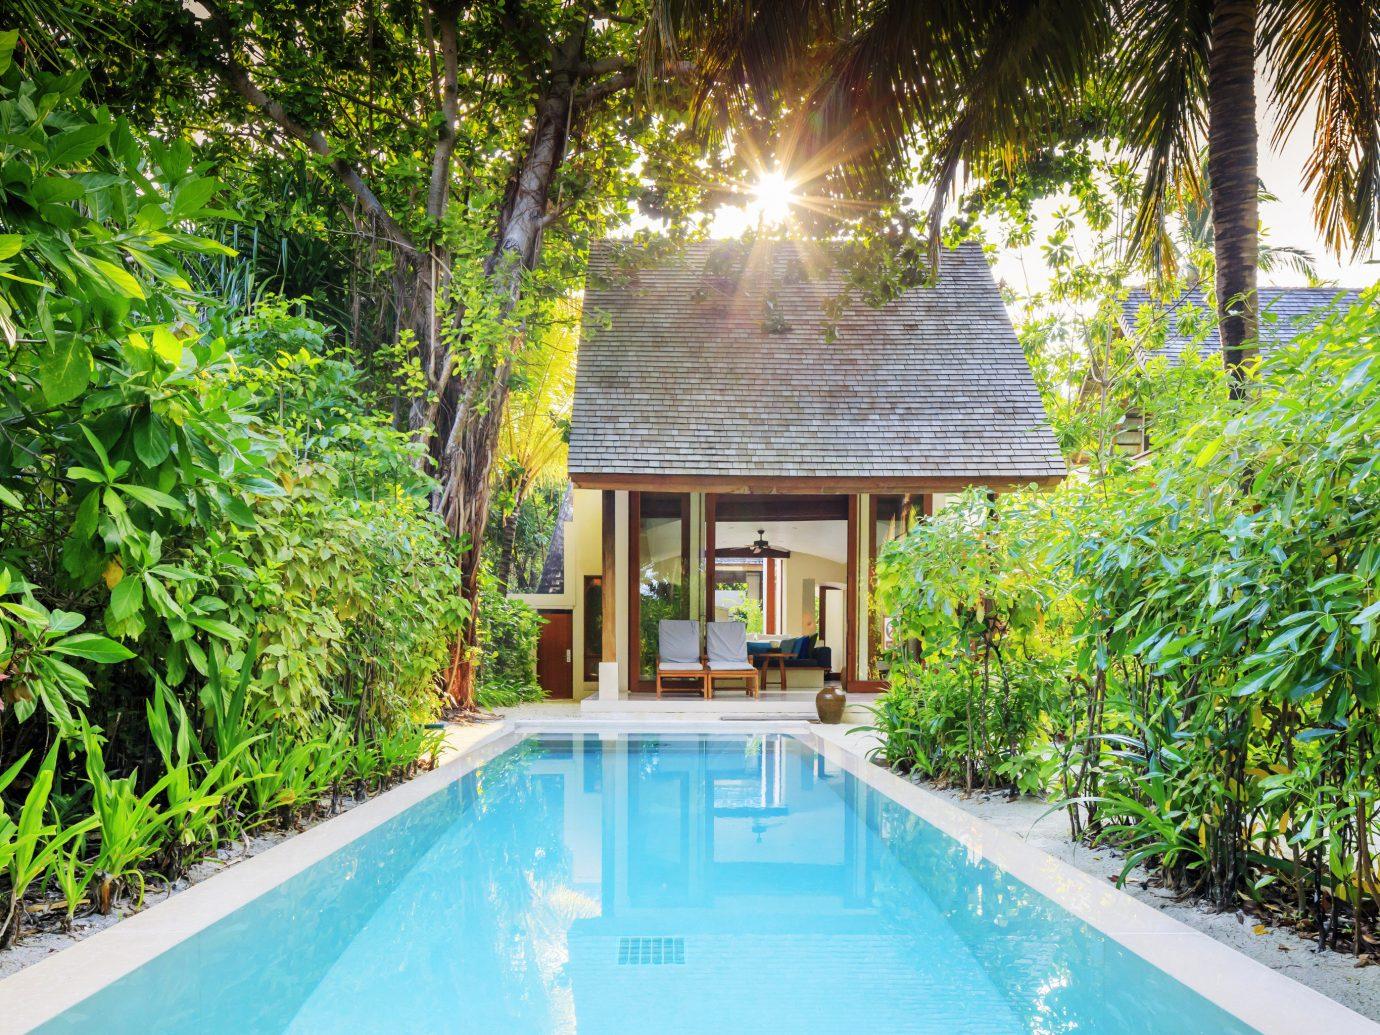 Hotels tree outdoor swimming pool property estate Resort backyard Villa Garden real estate mansion cottage Pool Jungle